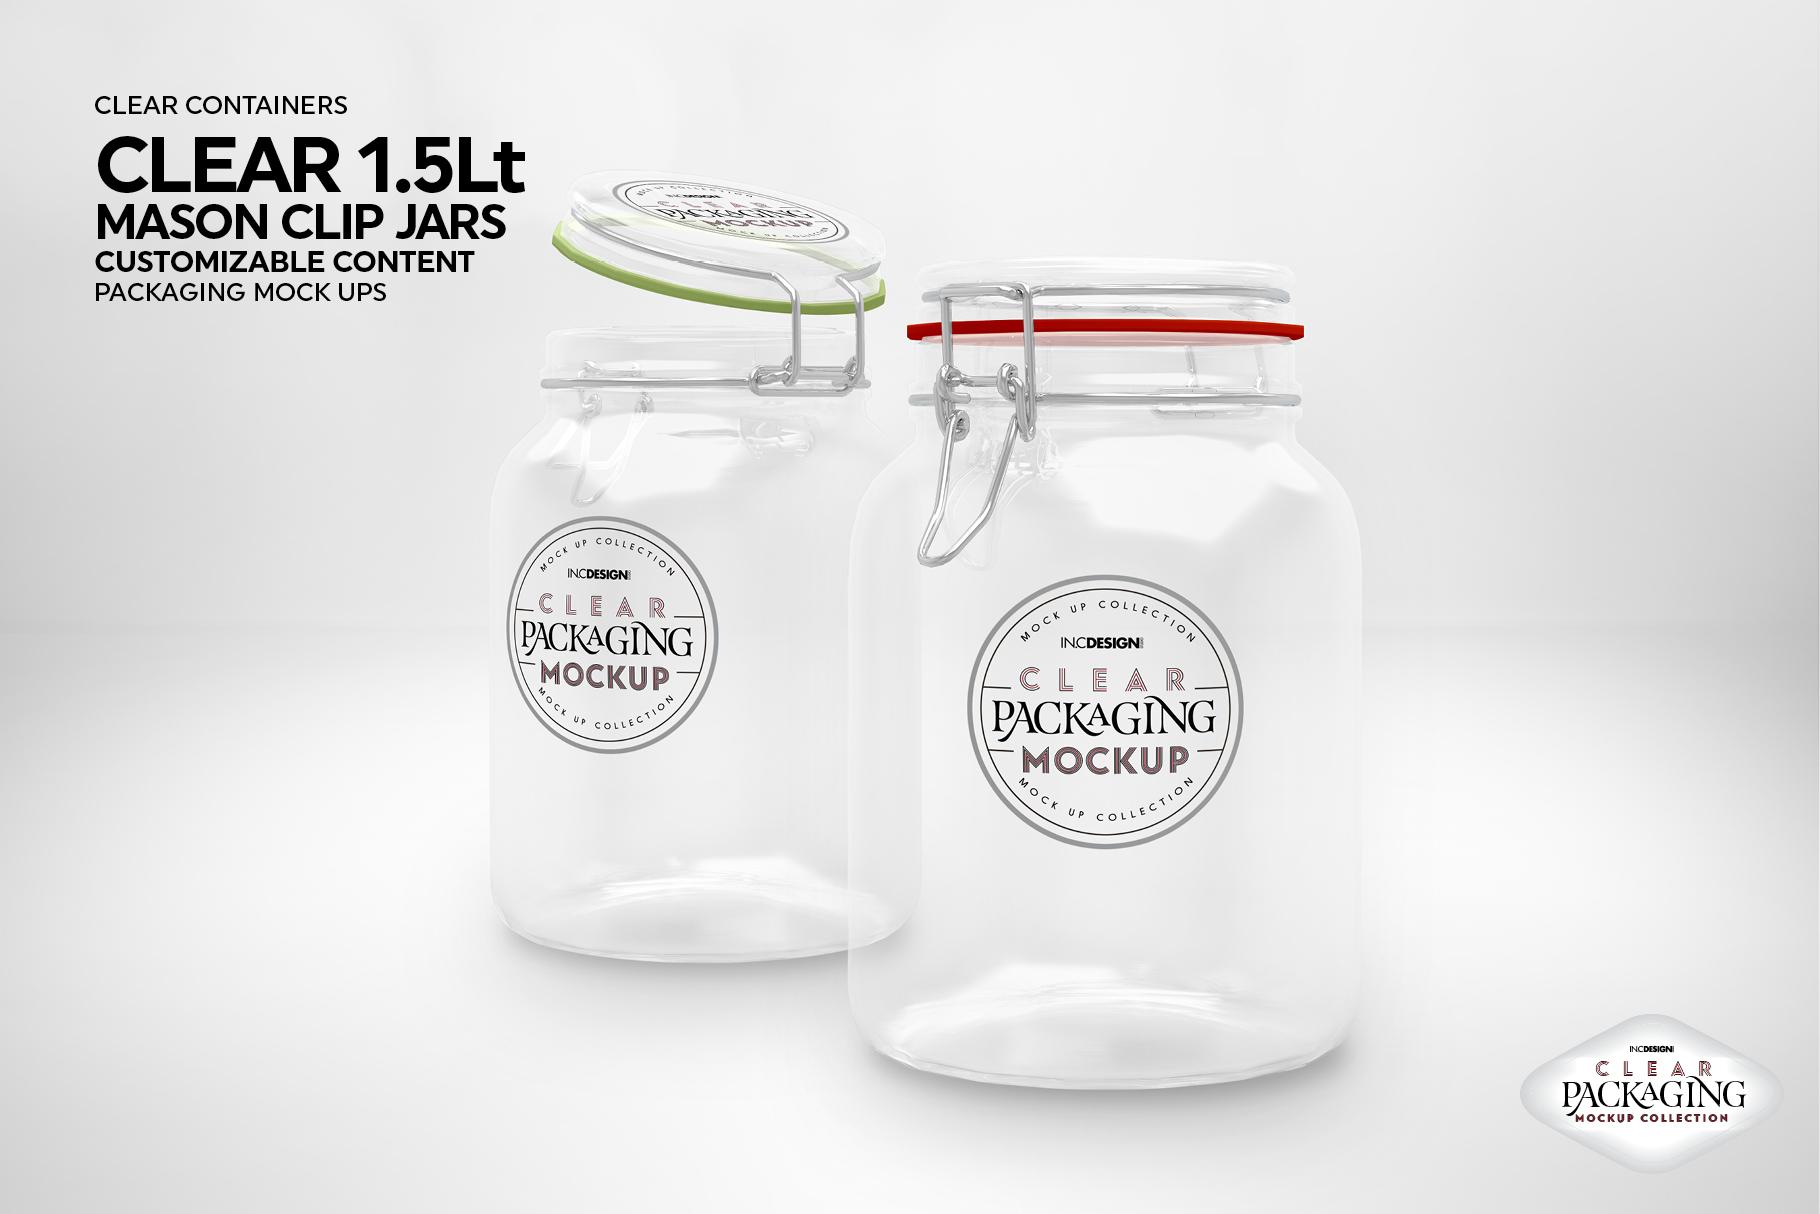 Clear 1.5 Liter Mason Clip Jar Packaging Mockup example image 6